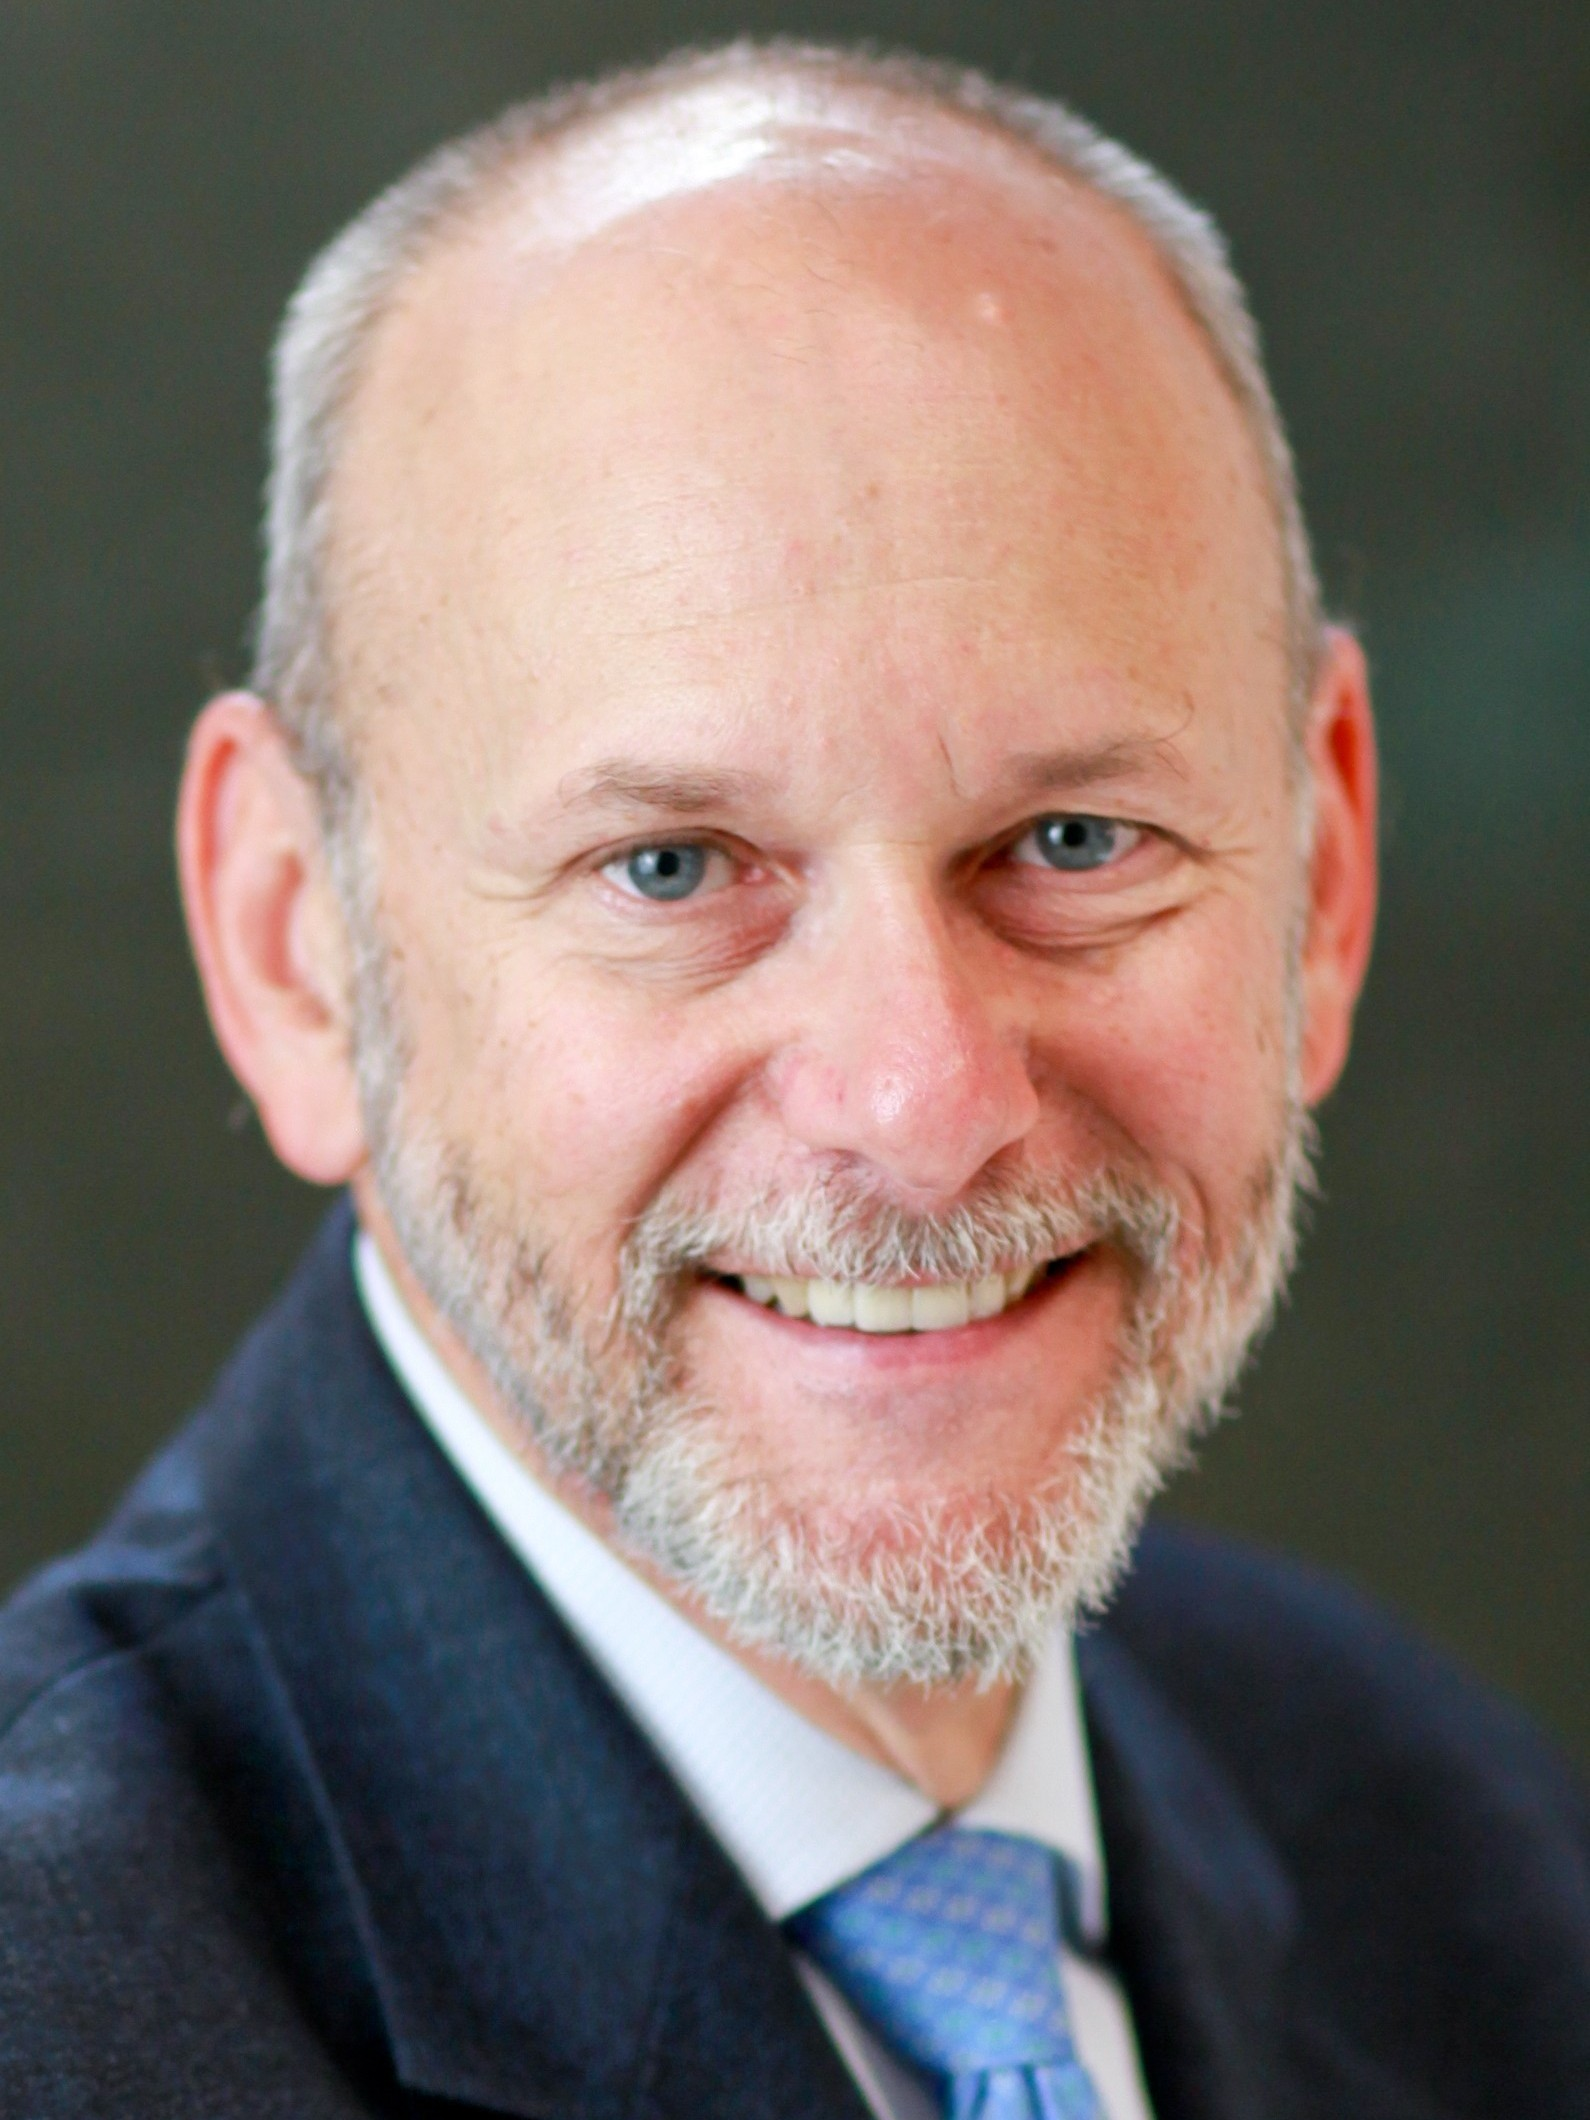 PROFESSOR: Larry Harris - DEPARTMENT: Marshall School of Business